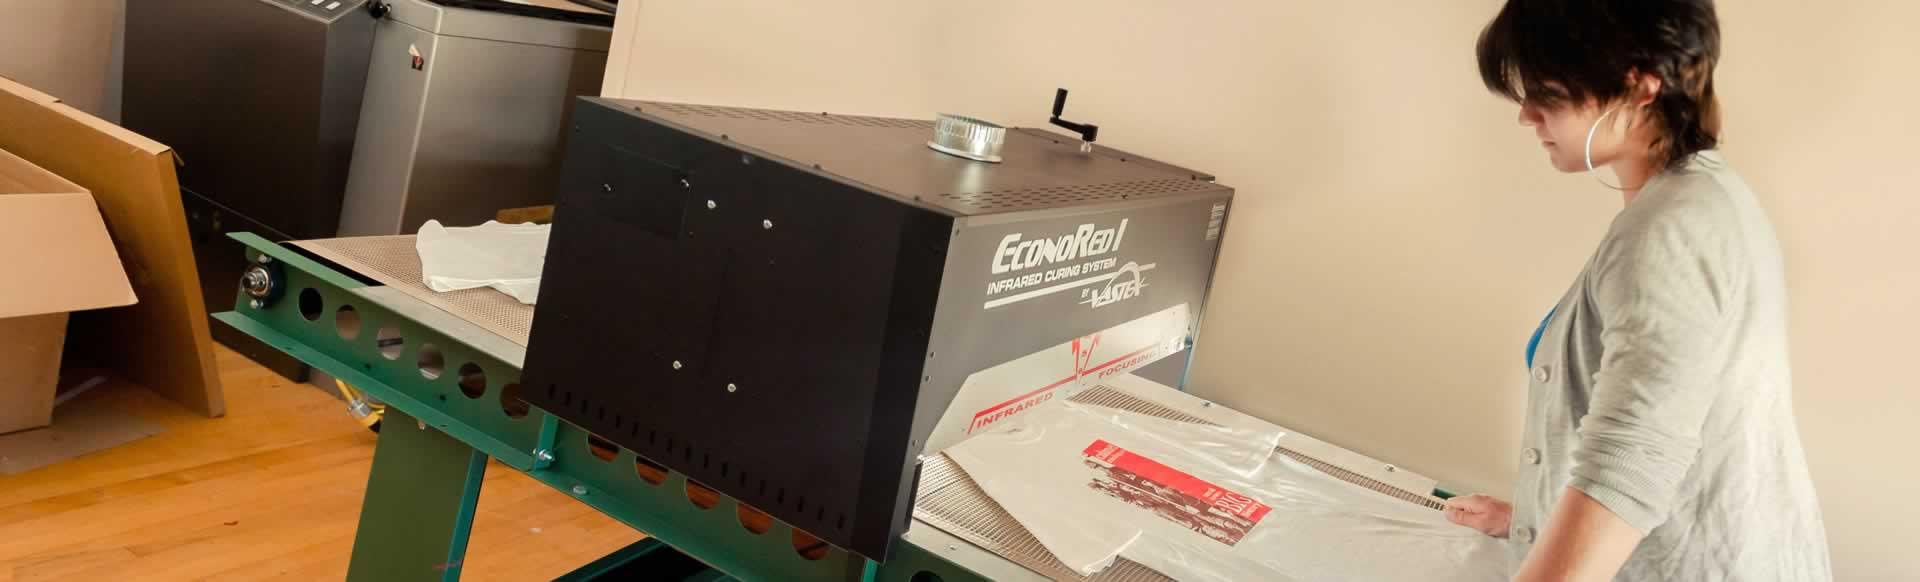 Screen Printing Equipment, Screen Printing Supplies, Screen